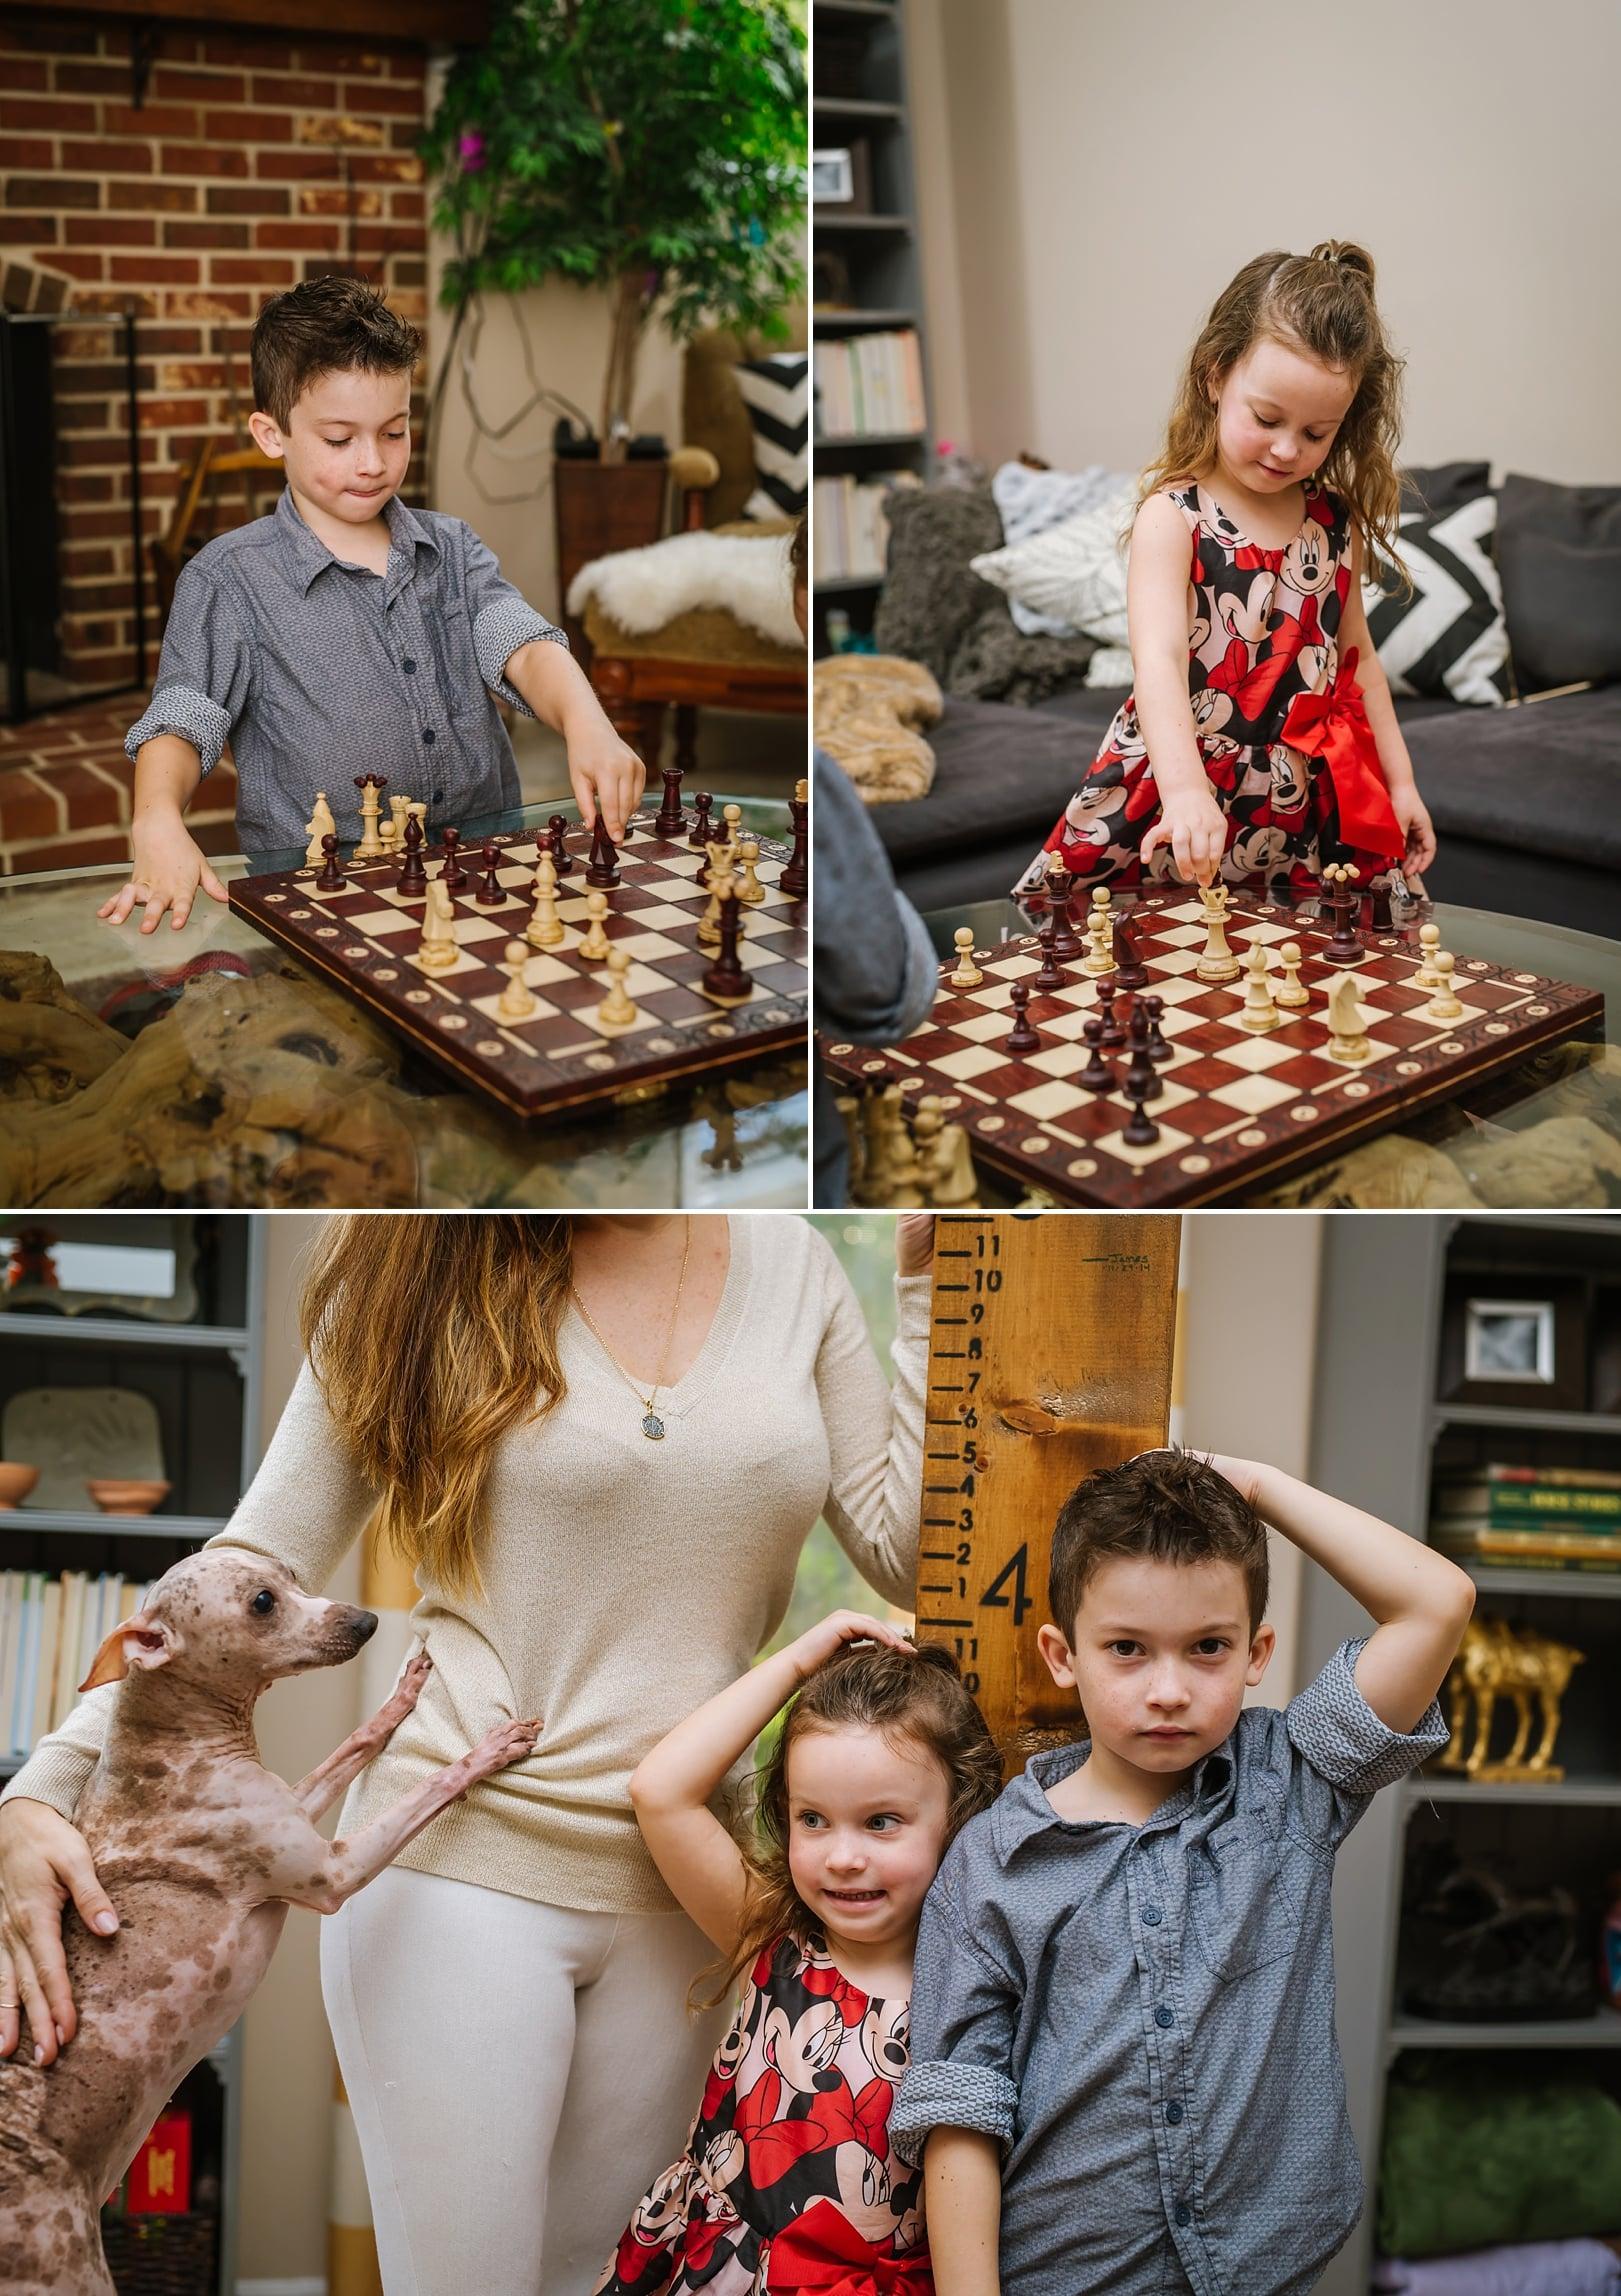 tampa-family-kids-children-photography_0005.jpg